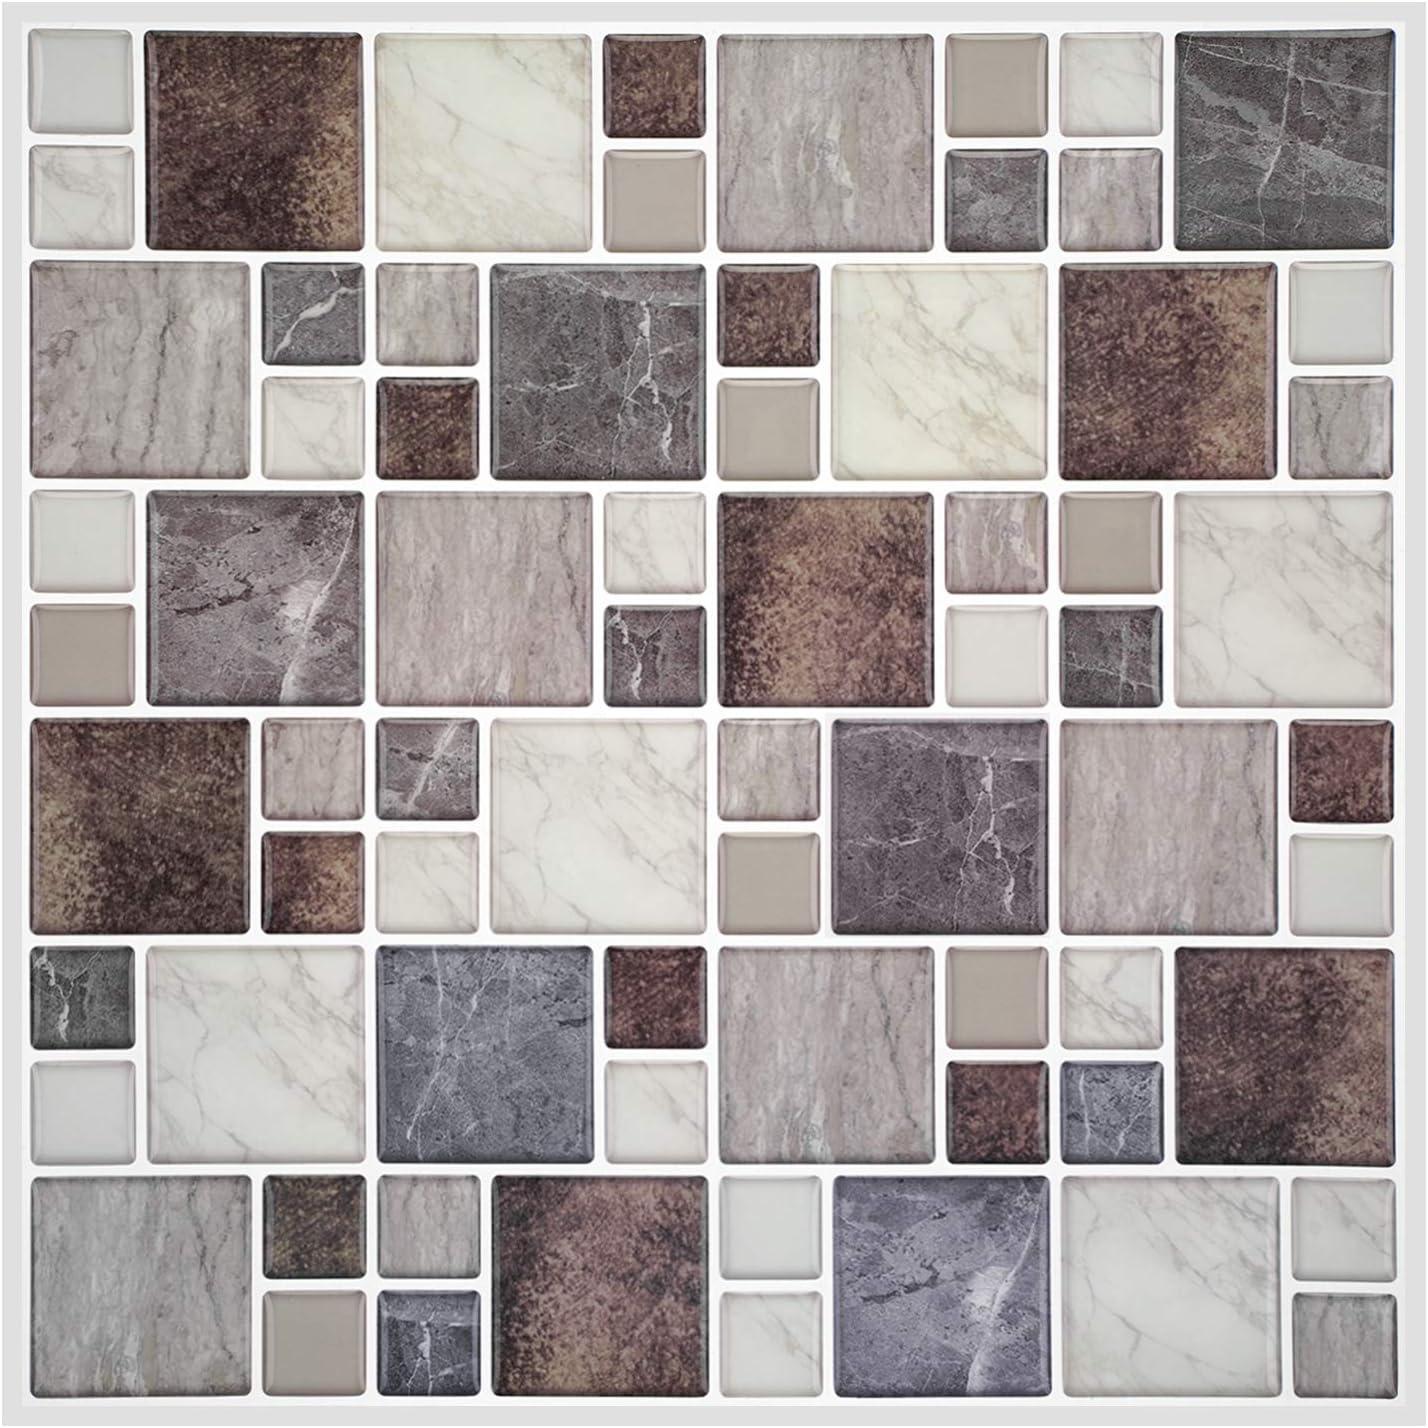 12-Sheet Peel and Stick trend New arrival rank Tile Stic Brown Marble Tiles Backsplash